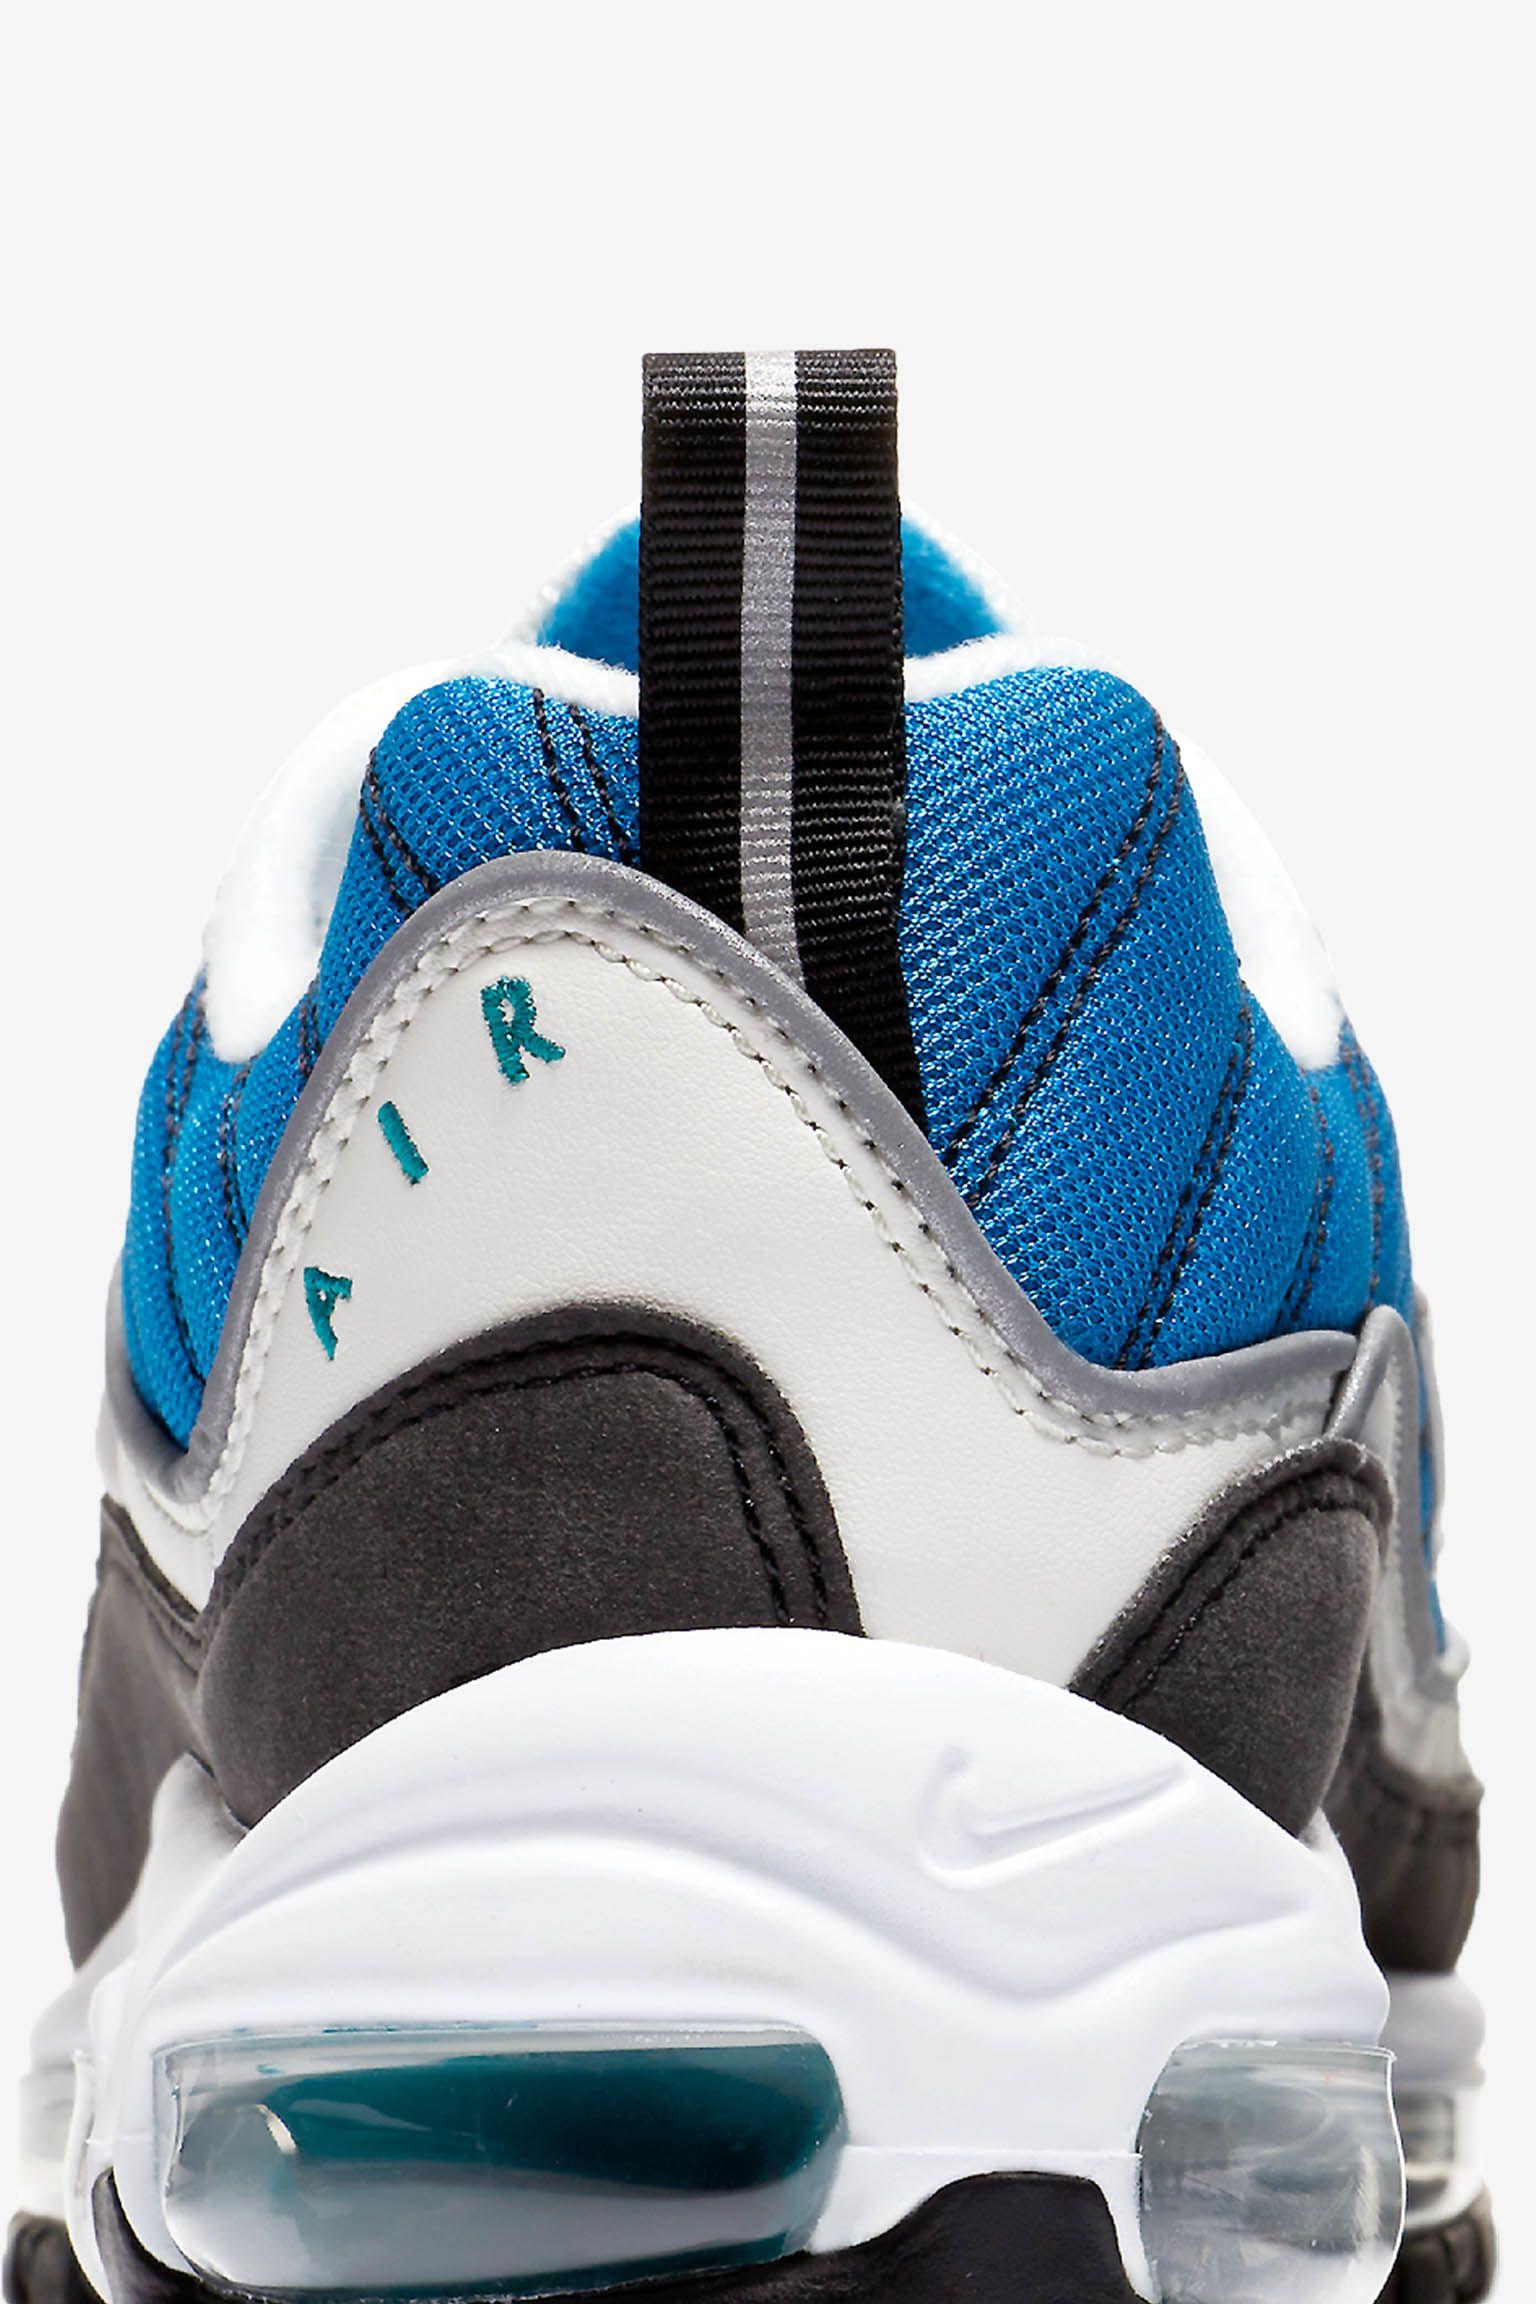 Nike Women's Air Max 98 'Radiant Emerald & Blue Nebula' Release Date